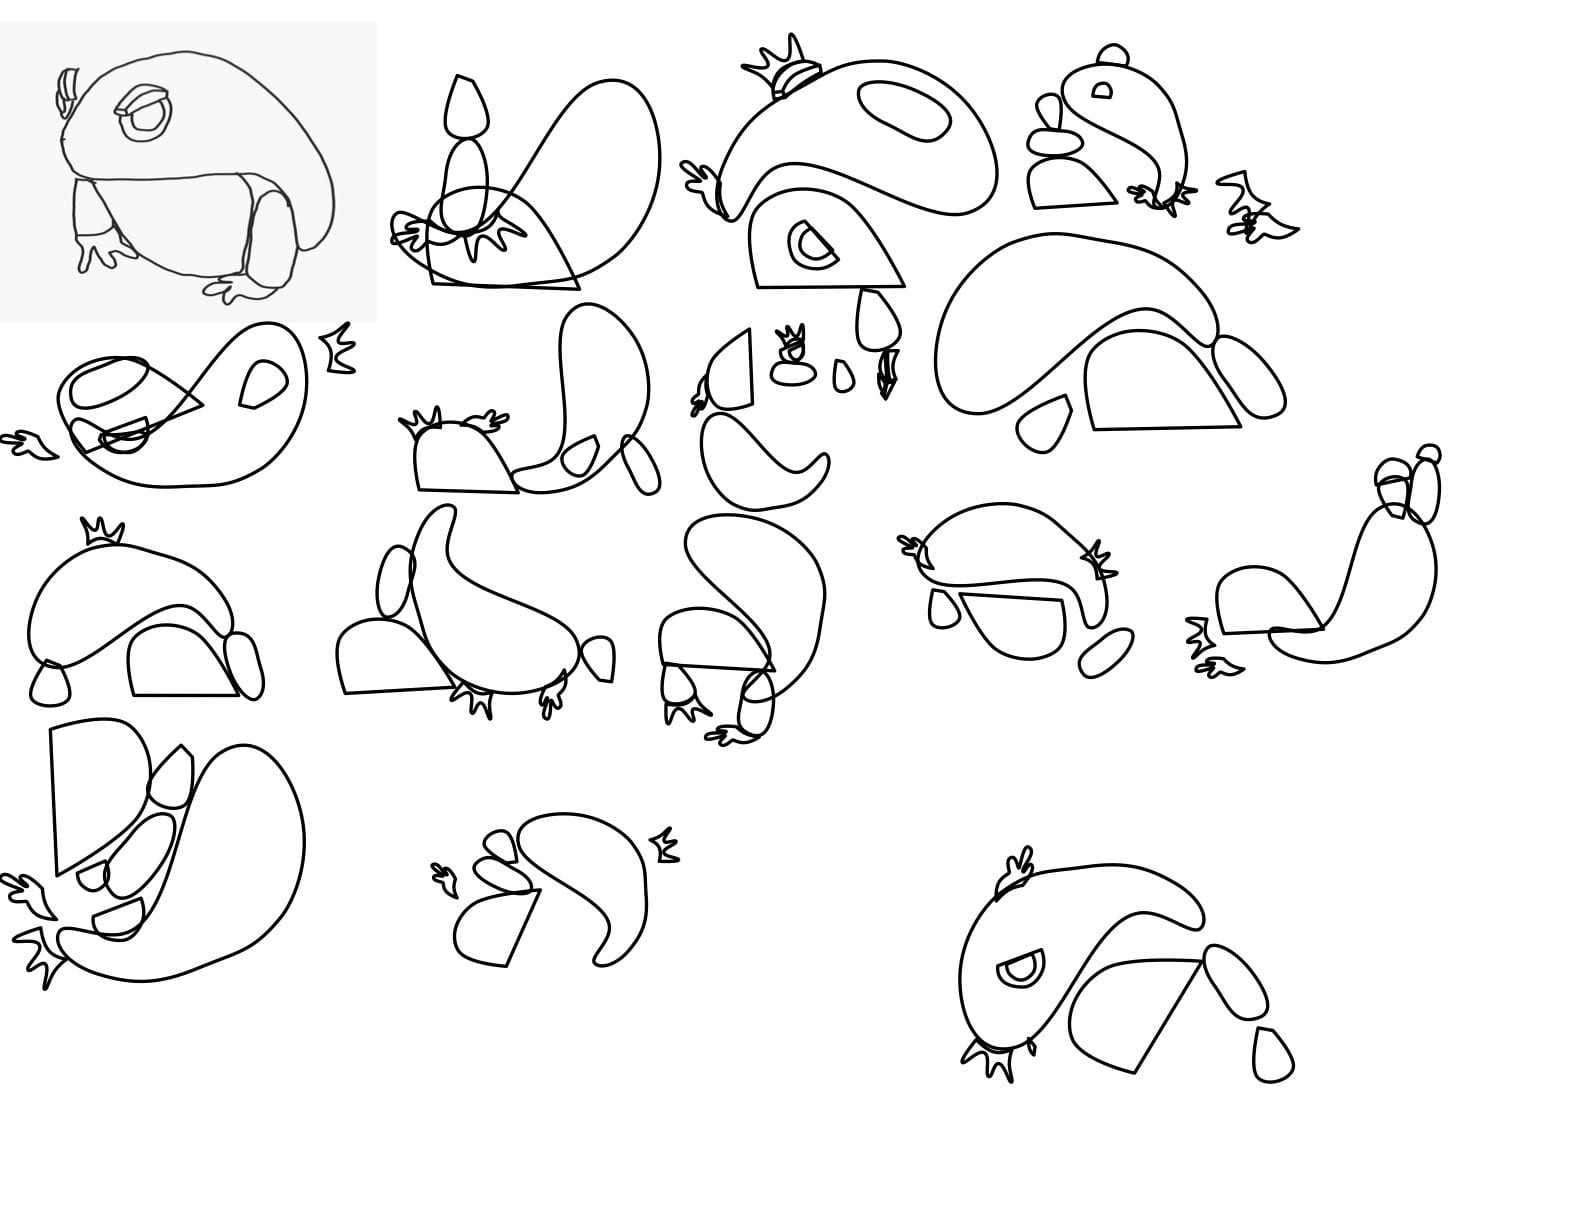 5 Animals Worksheets Preschool For Kids